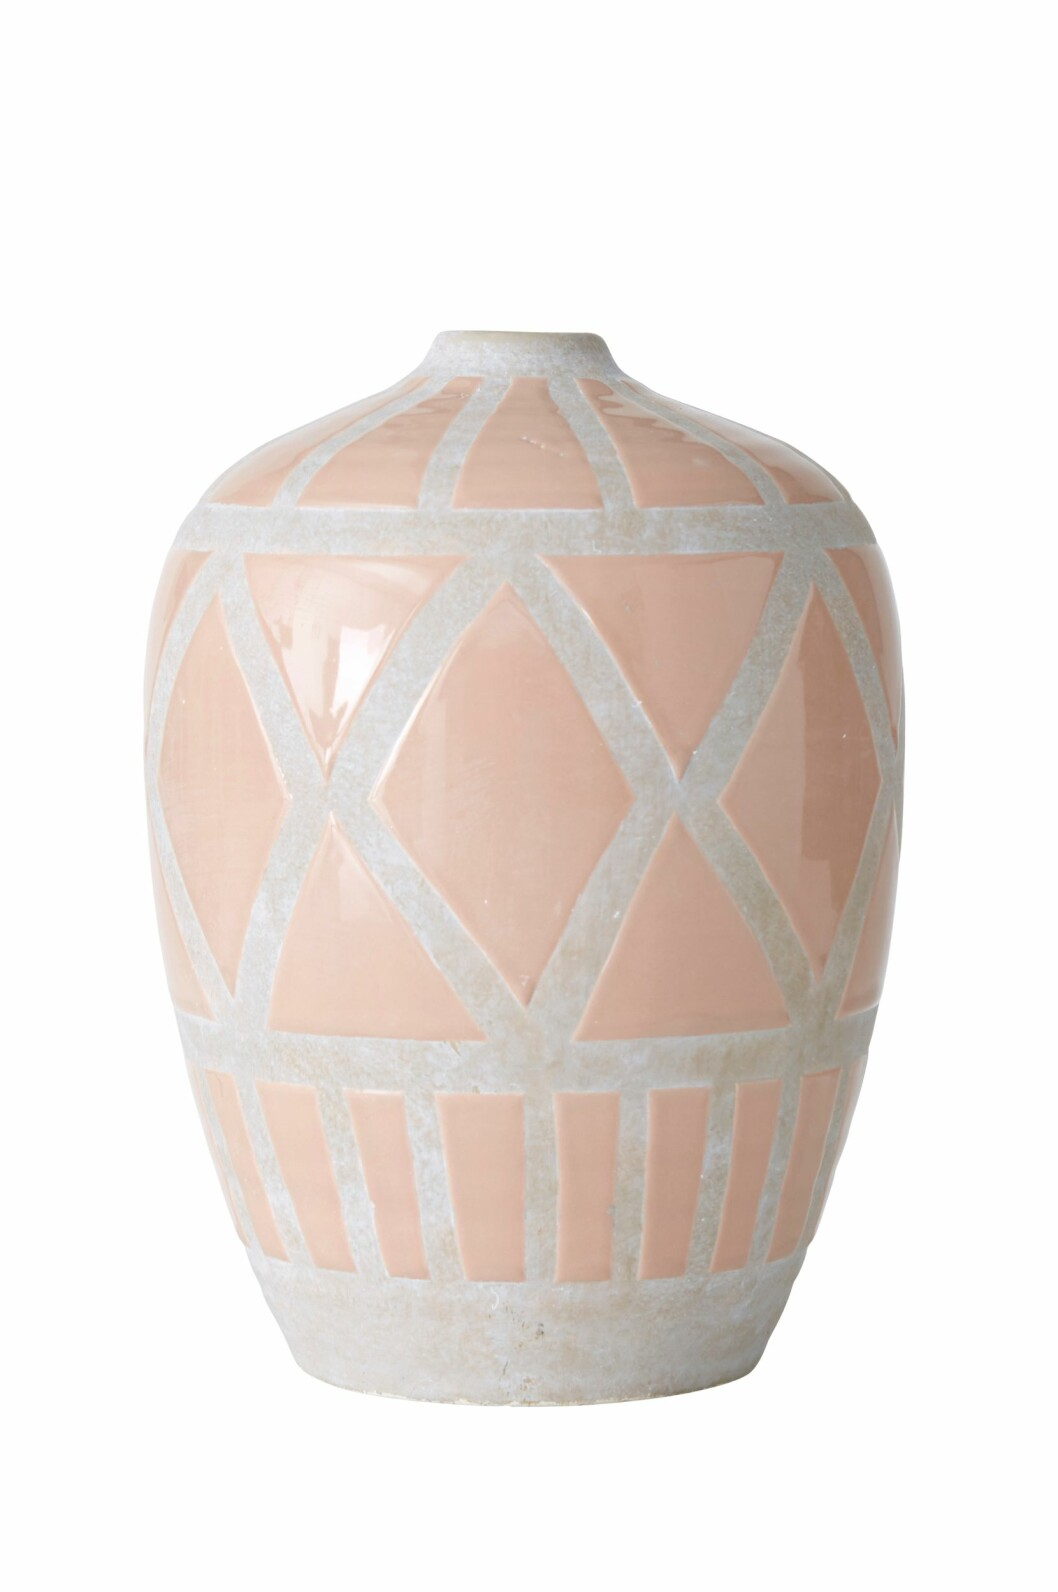 Vase fra Ellos |499,-| https://www.ellos.no/ellos-home/vase-eclip-hoyde-25-cm/1020803